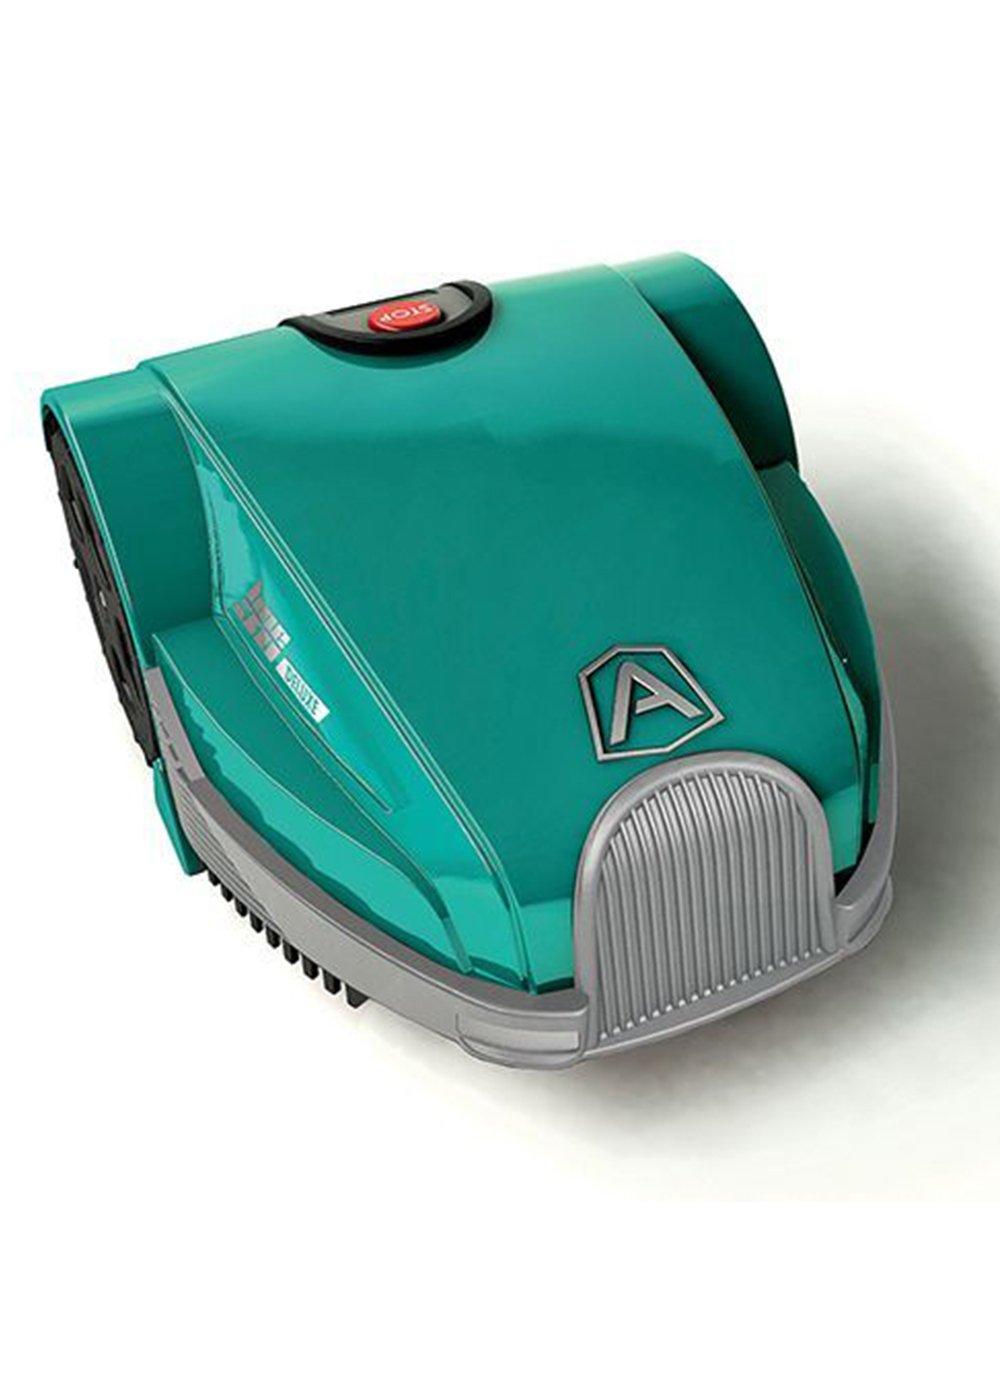 Césped robot cortacésped Ambrogio L30 Deluxe: Amazon.es: Hogar